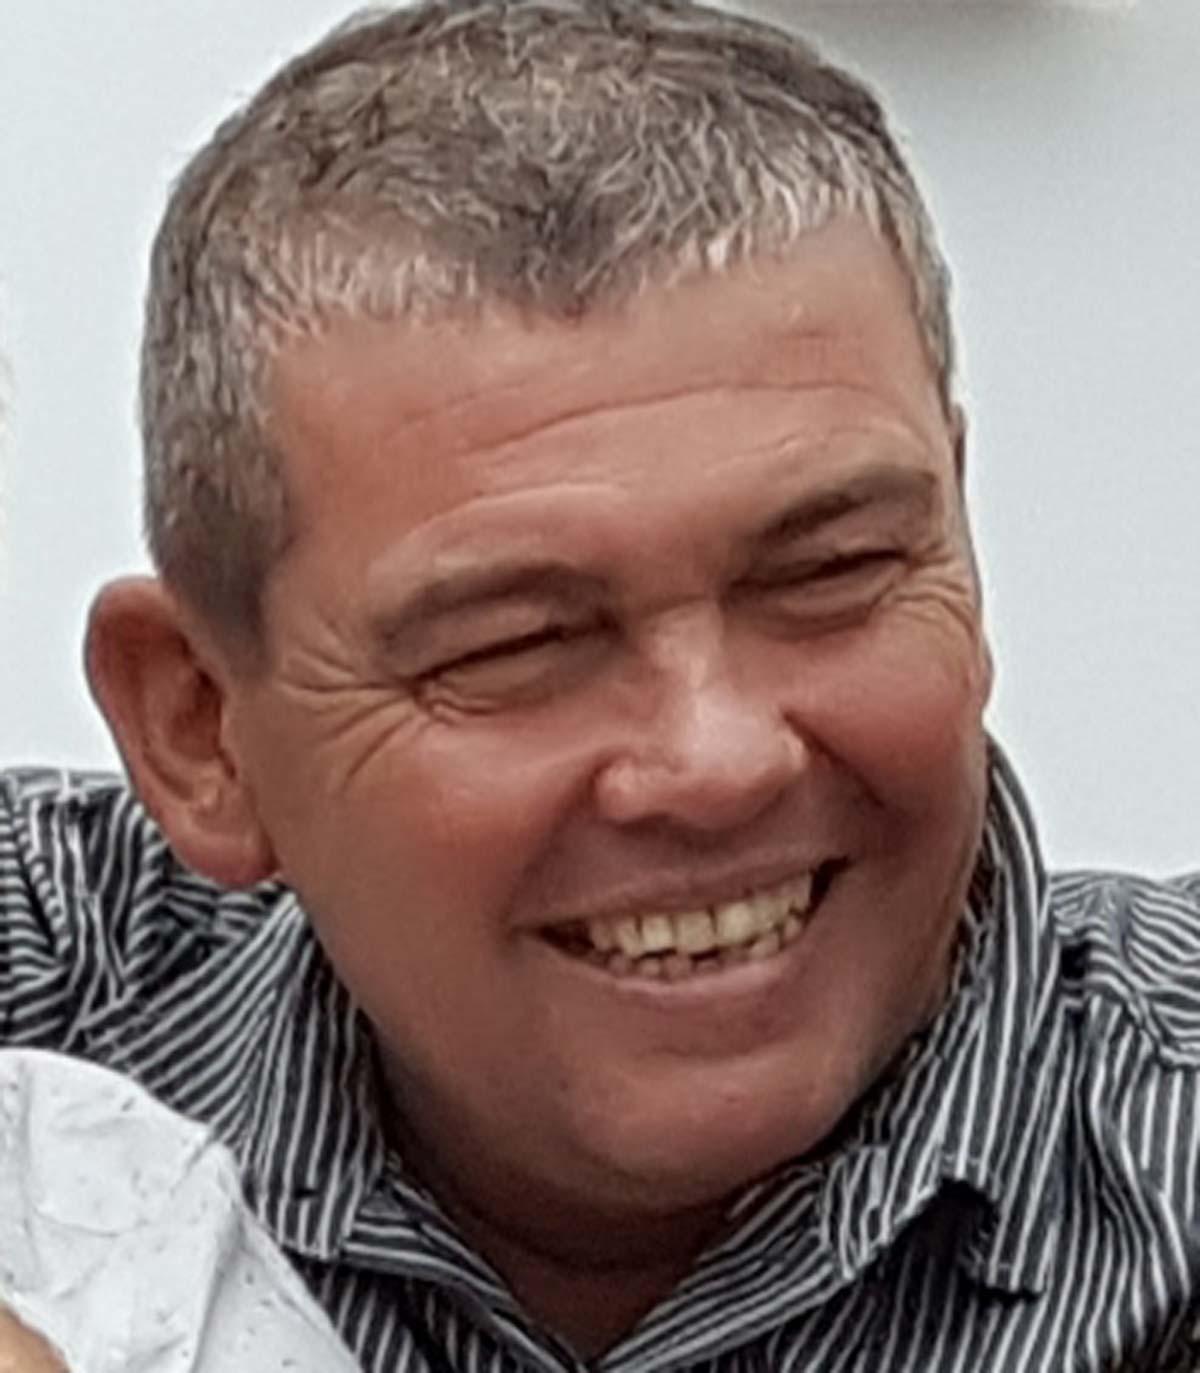 David Grant-Jones